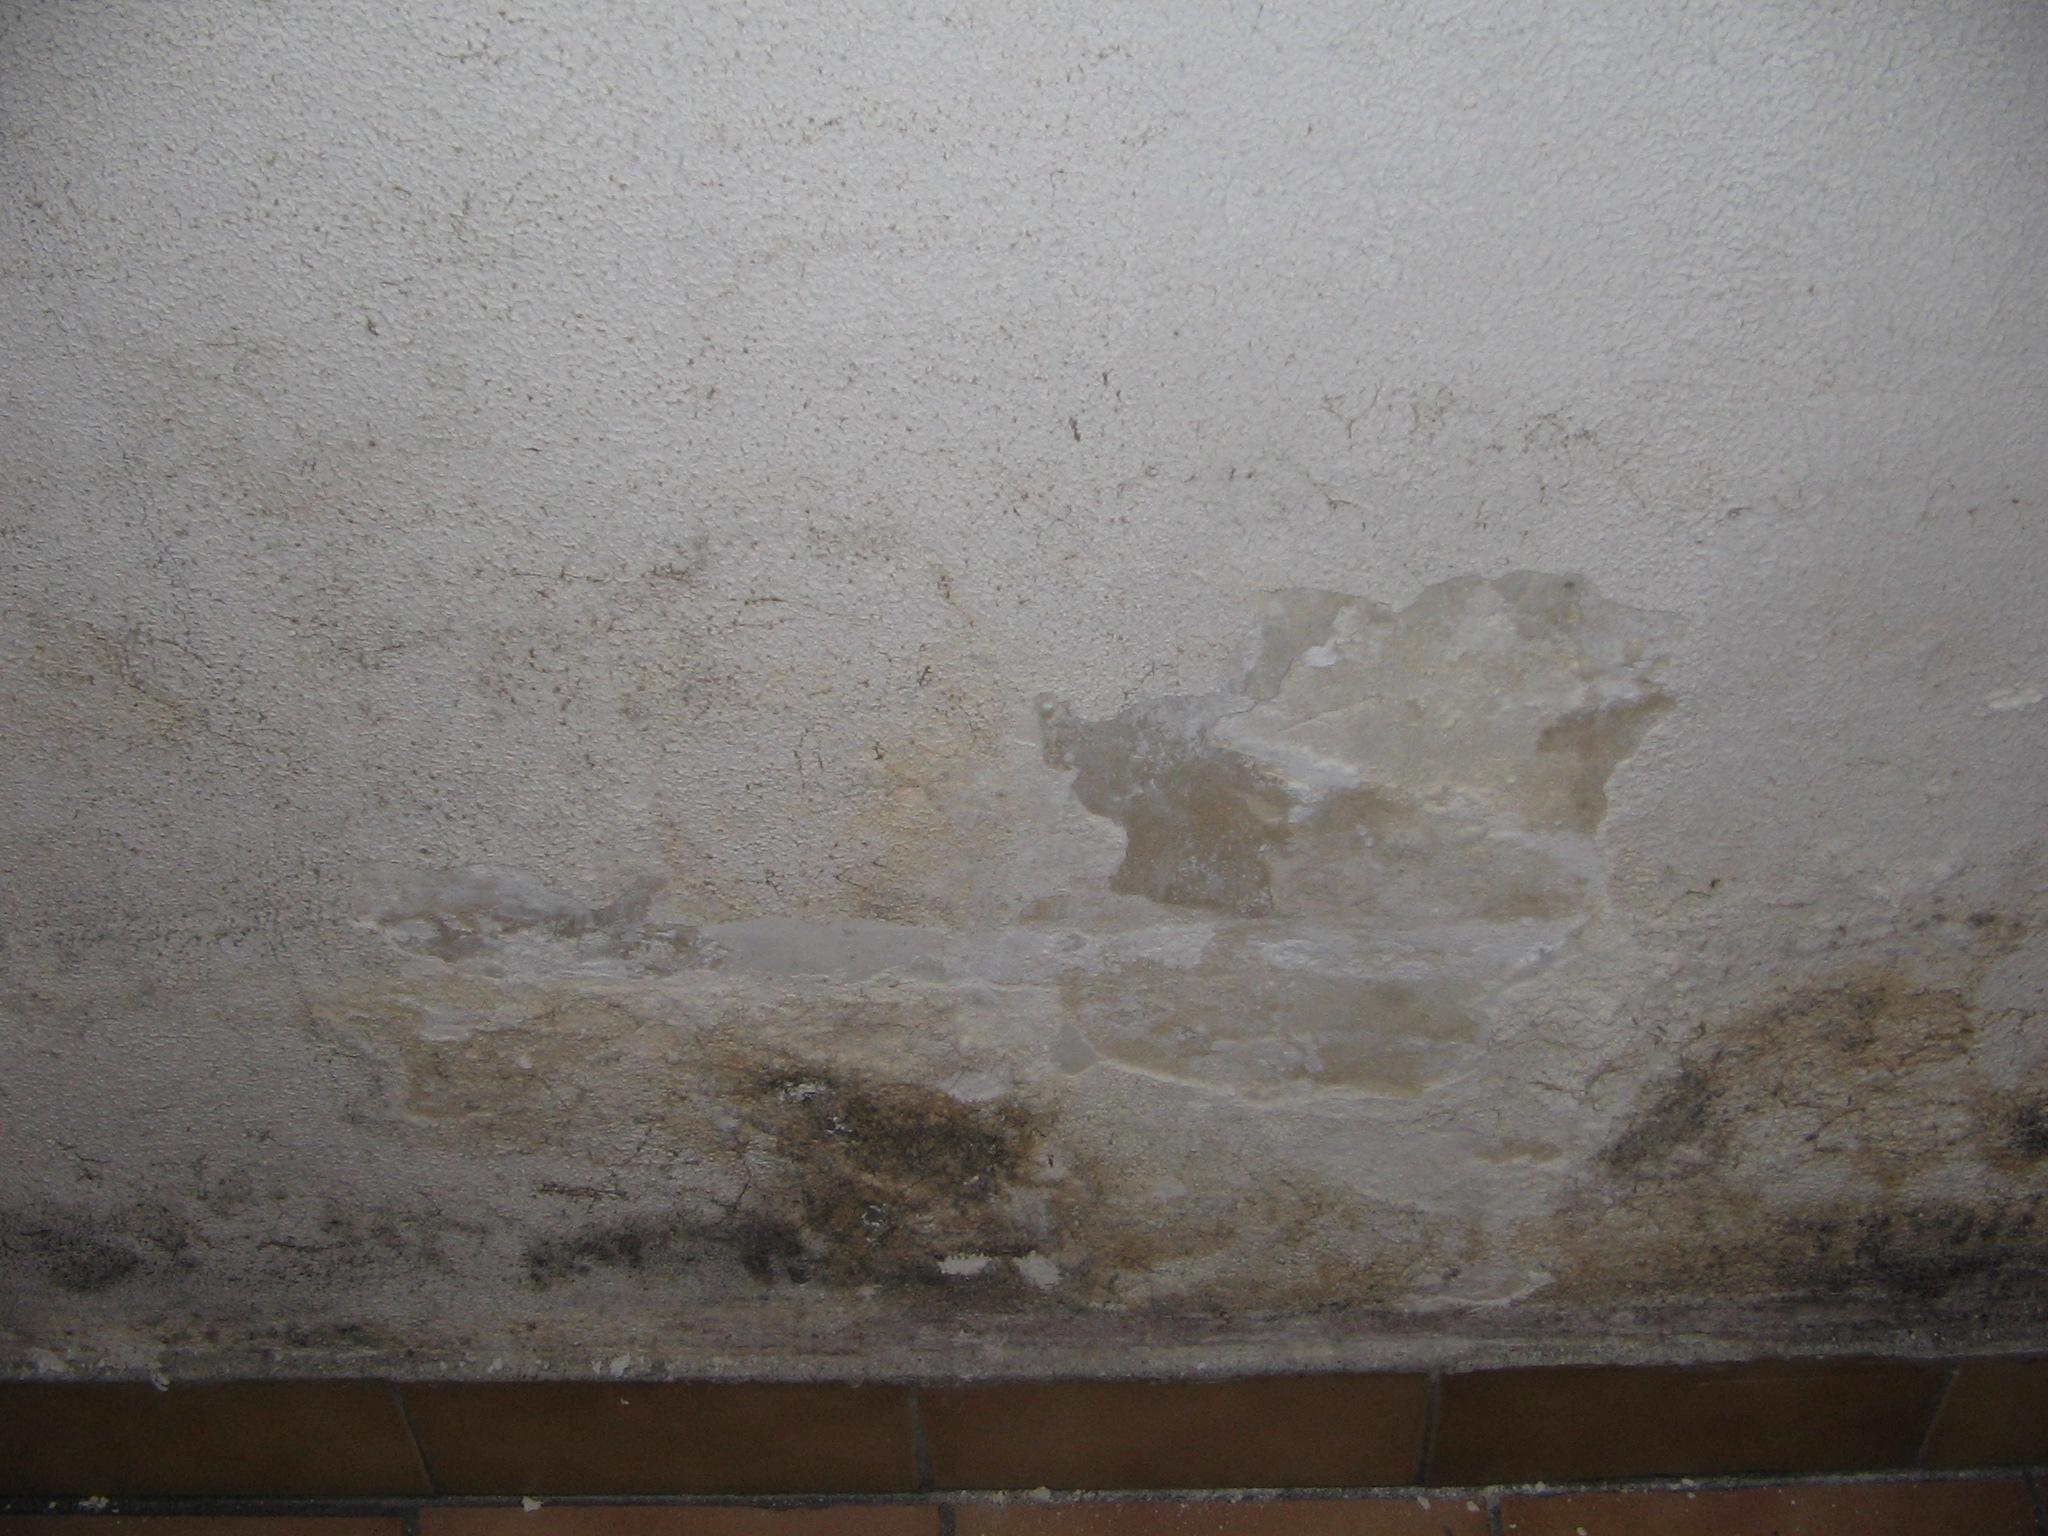 Peinture sur mur humide peinture antihumidit v blanc l for Peinture sur carrelage mural